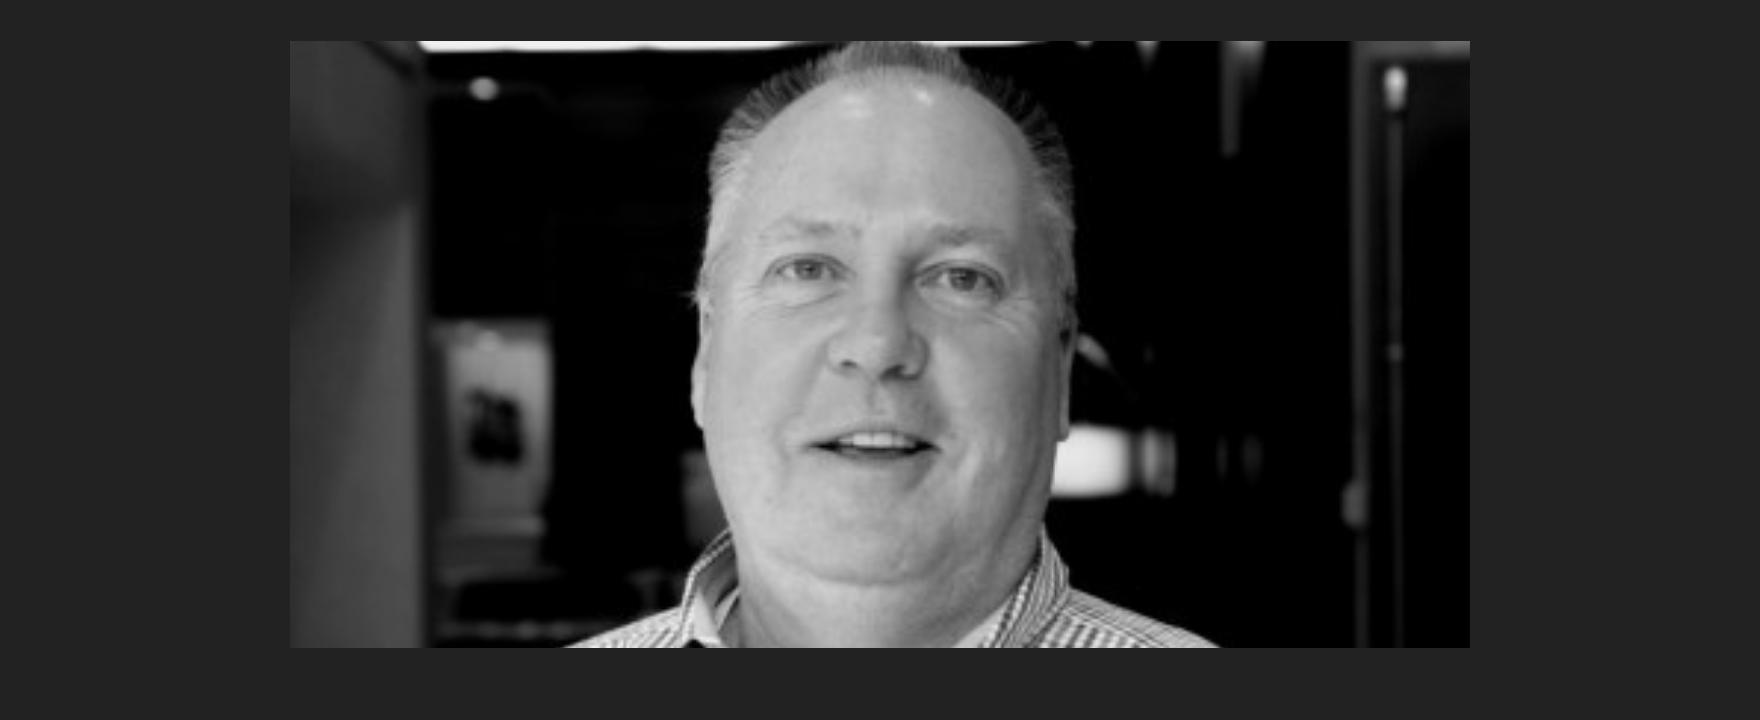 Grant Fraser, Founder & Board Member at Navigator Business Solutions